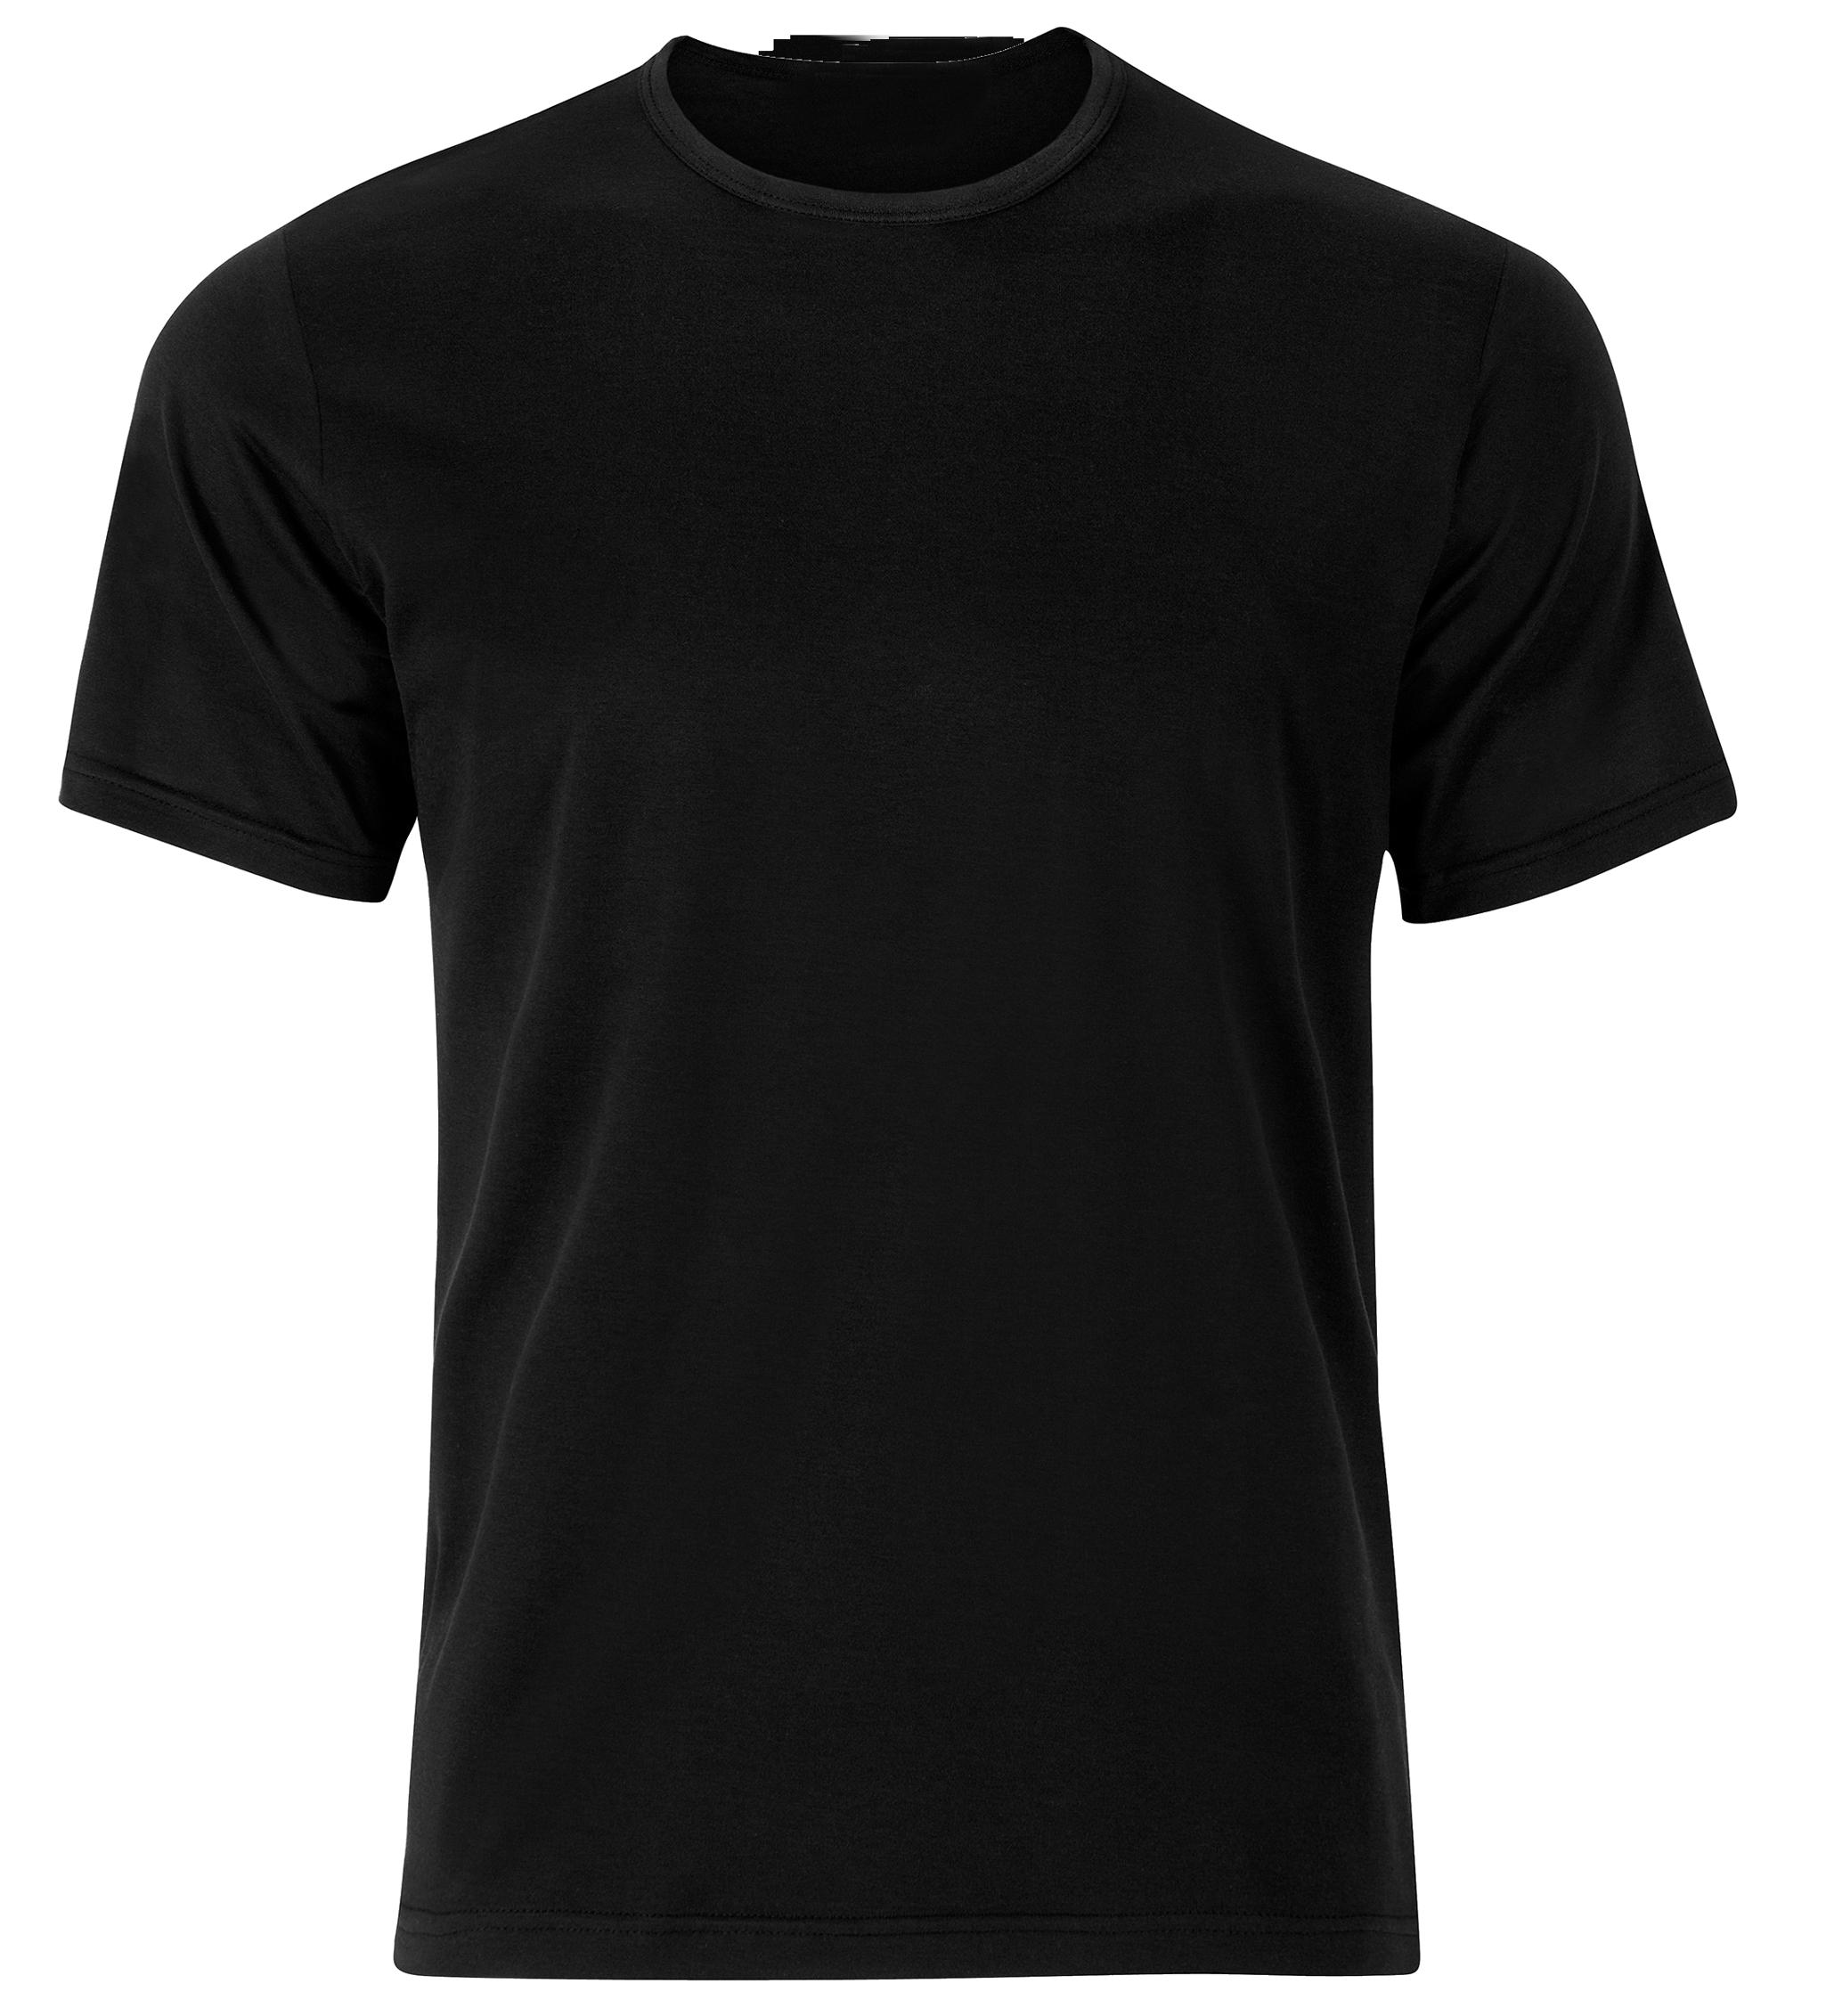 Black T Shirt PNG Transparent Image - Tshirt PNG